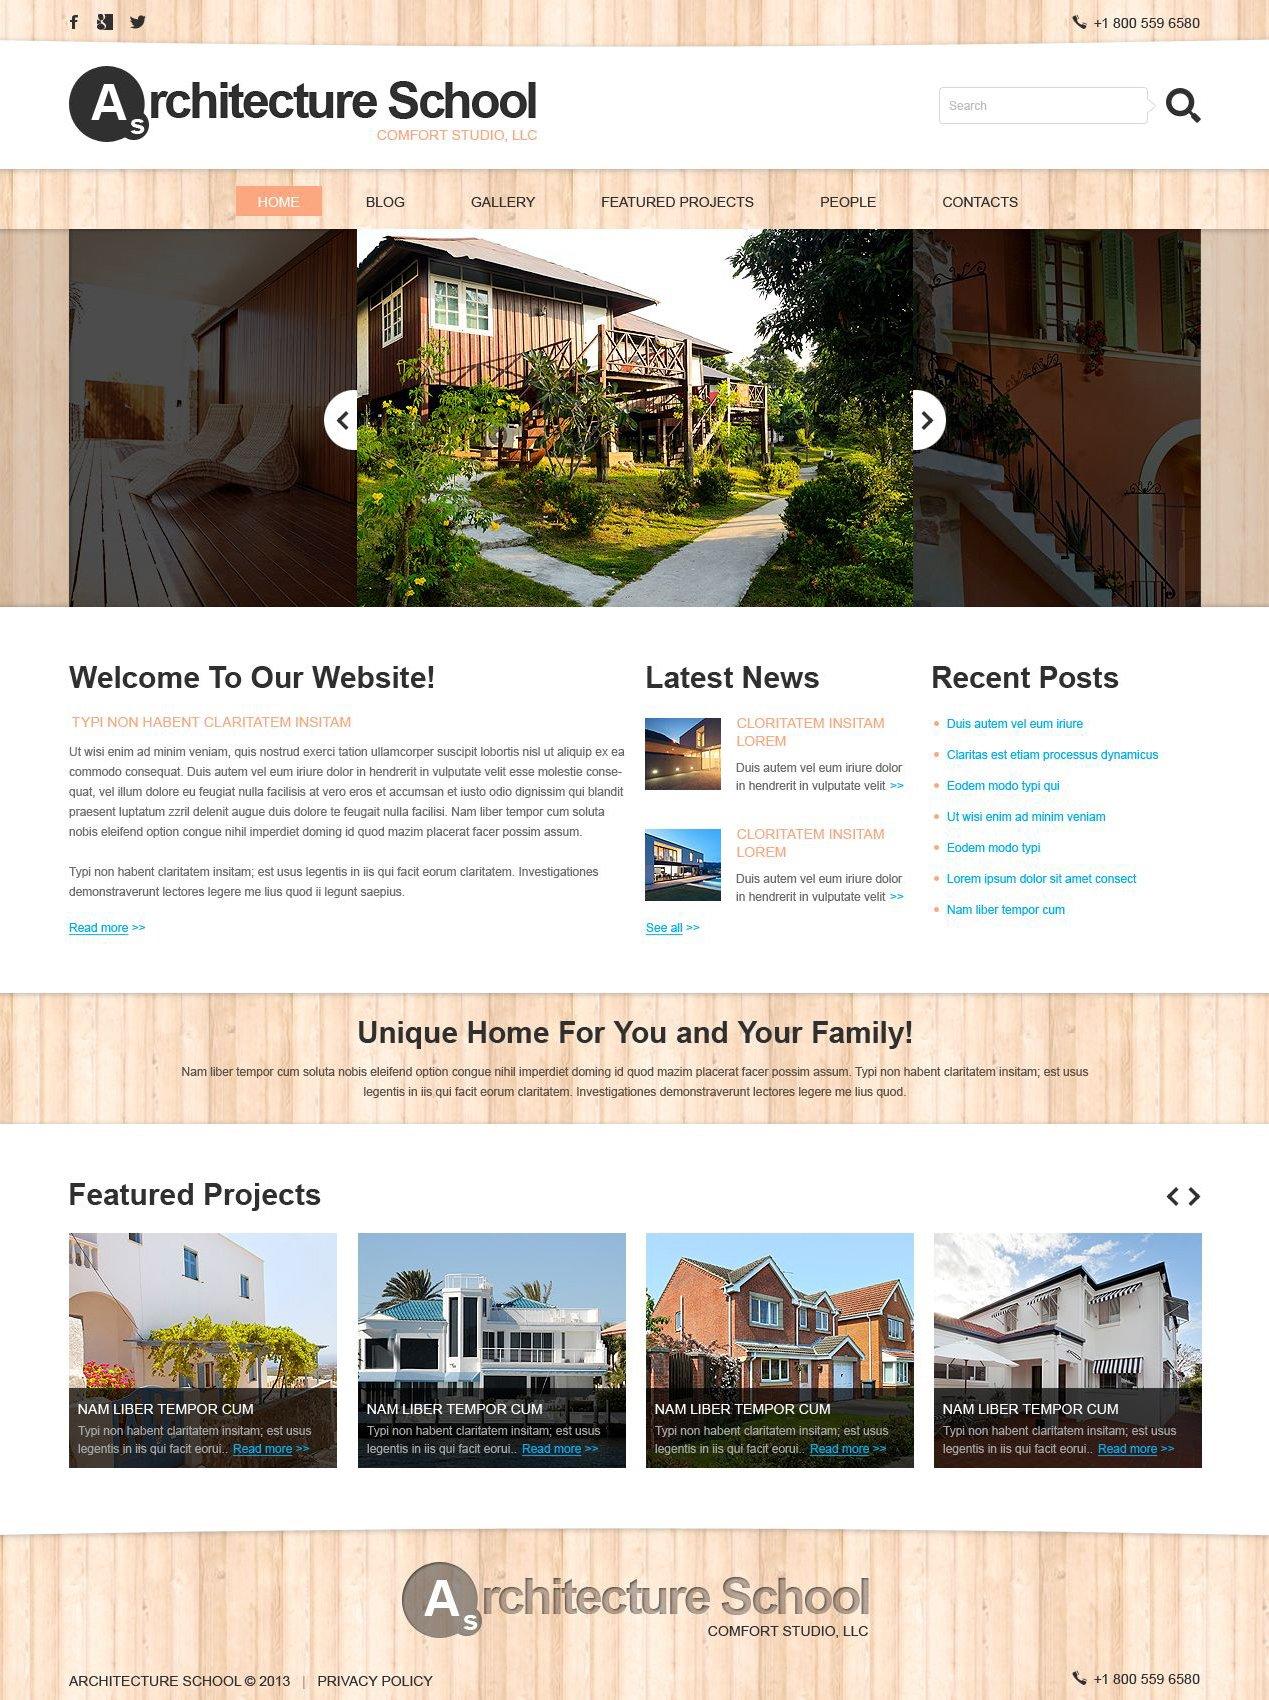 Plantilla Joomla Responsive para Sitio de Arquitectura #51756 - captura de pantalla